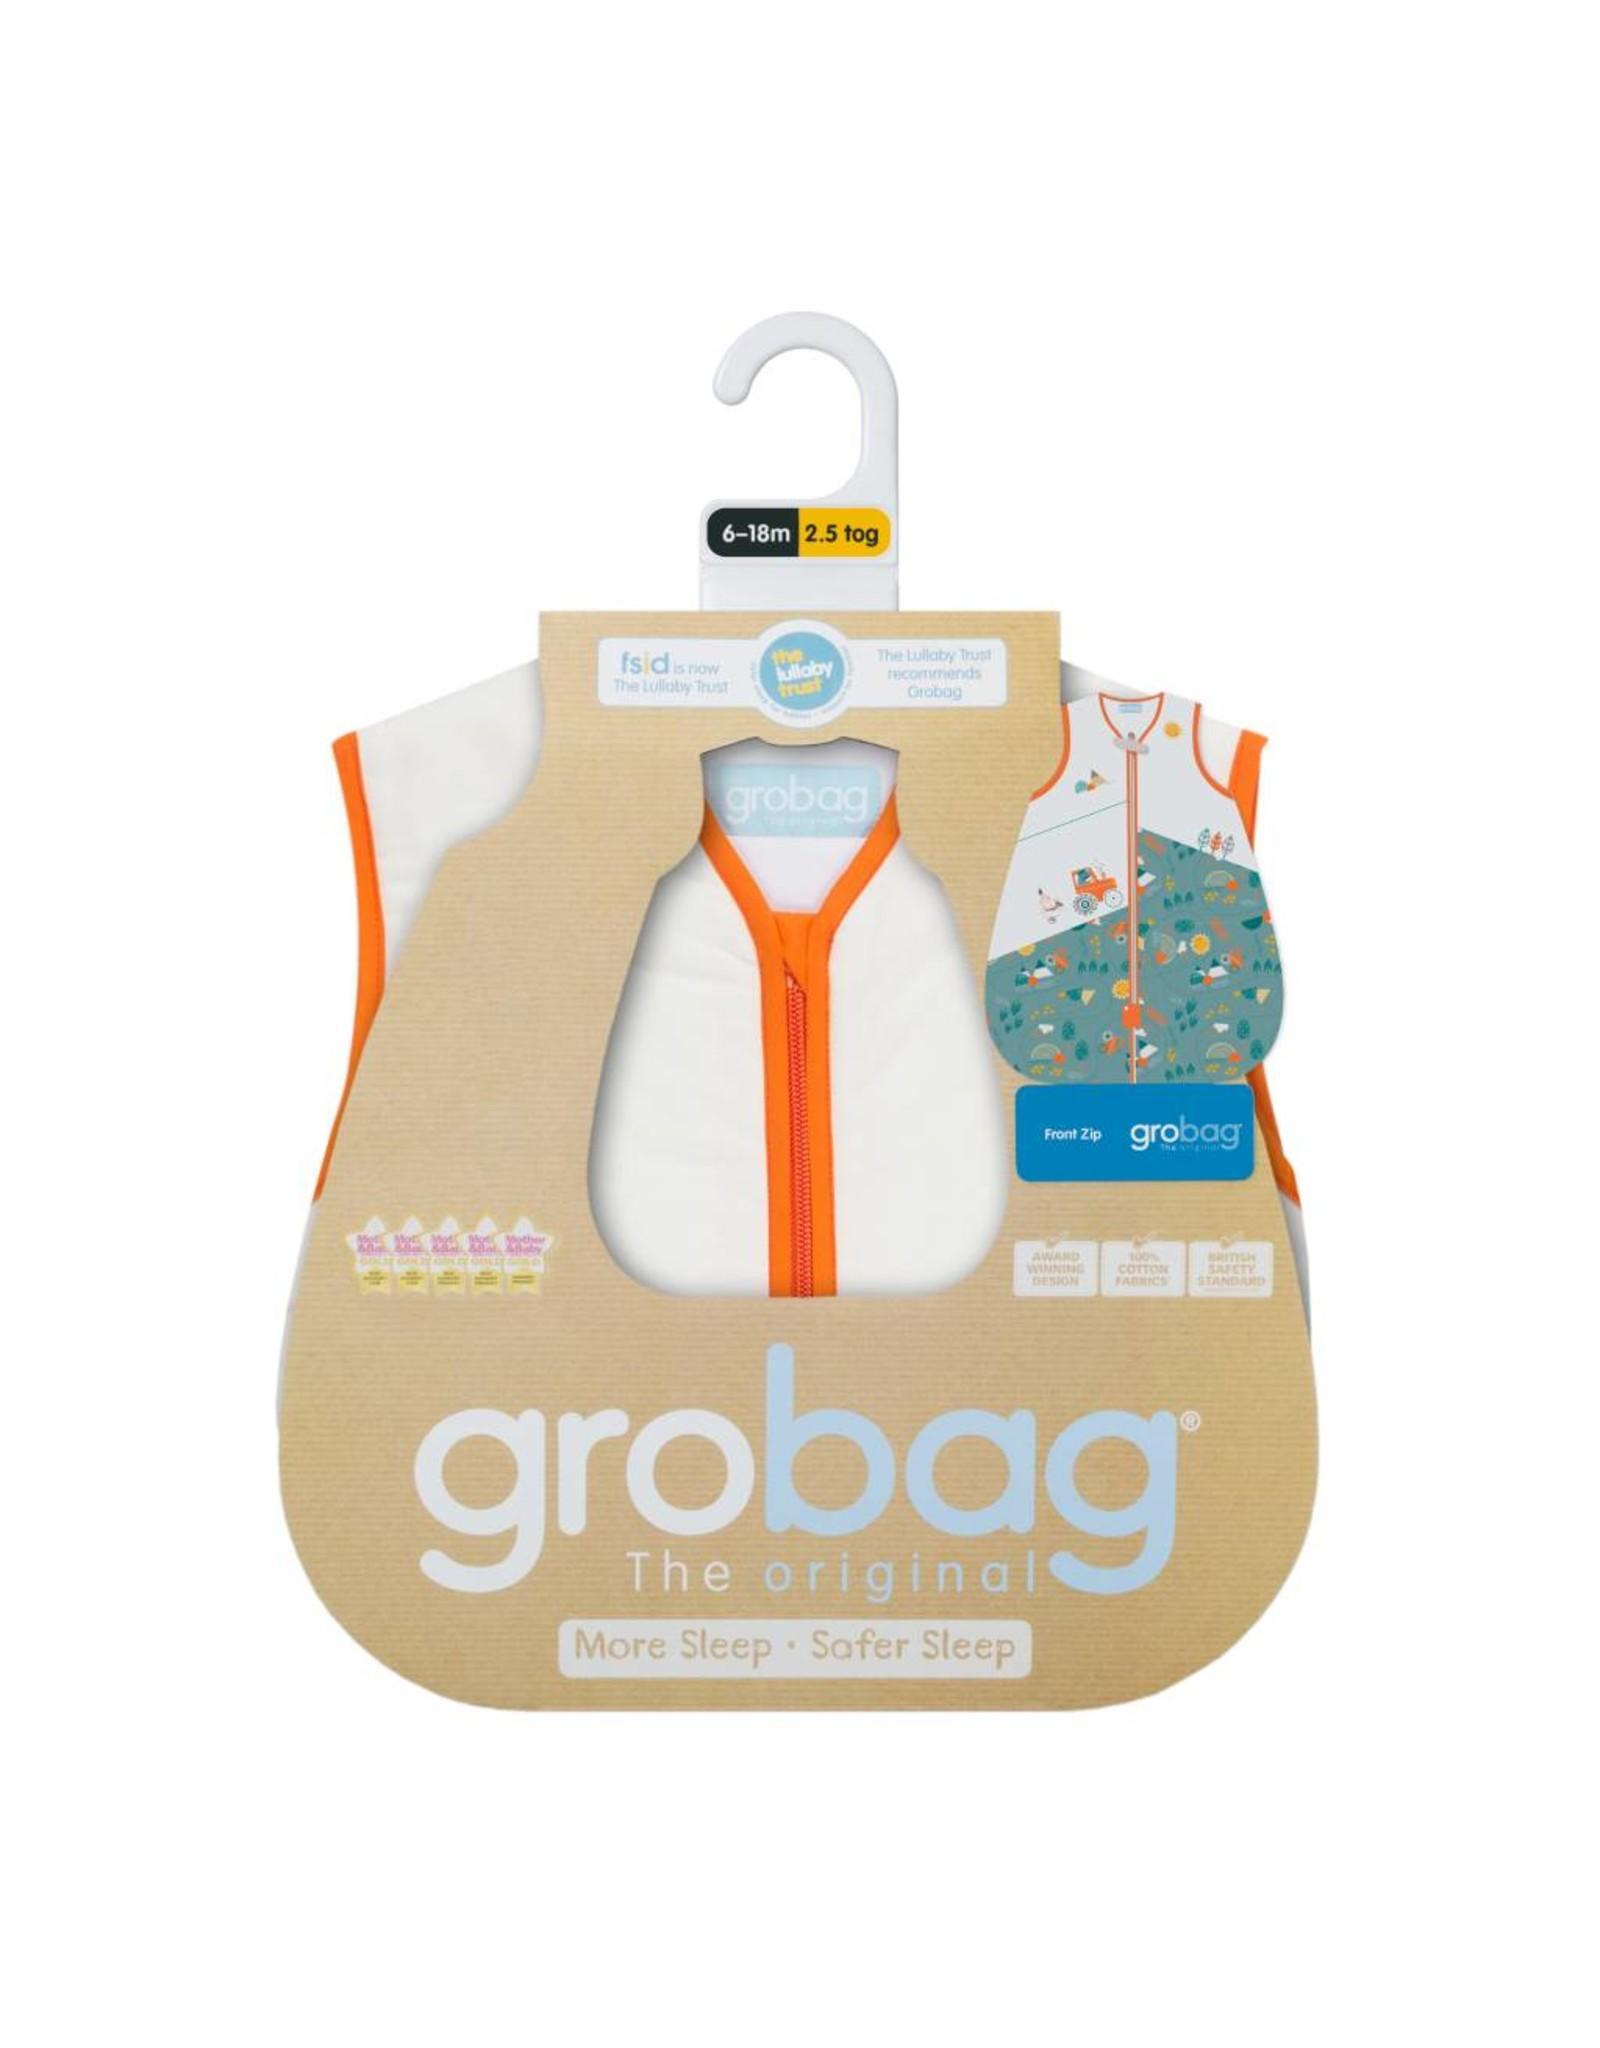 Gro Company Go Company - Folk Farm Gro Bag 2.5 Tog 6-18 months